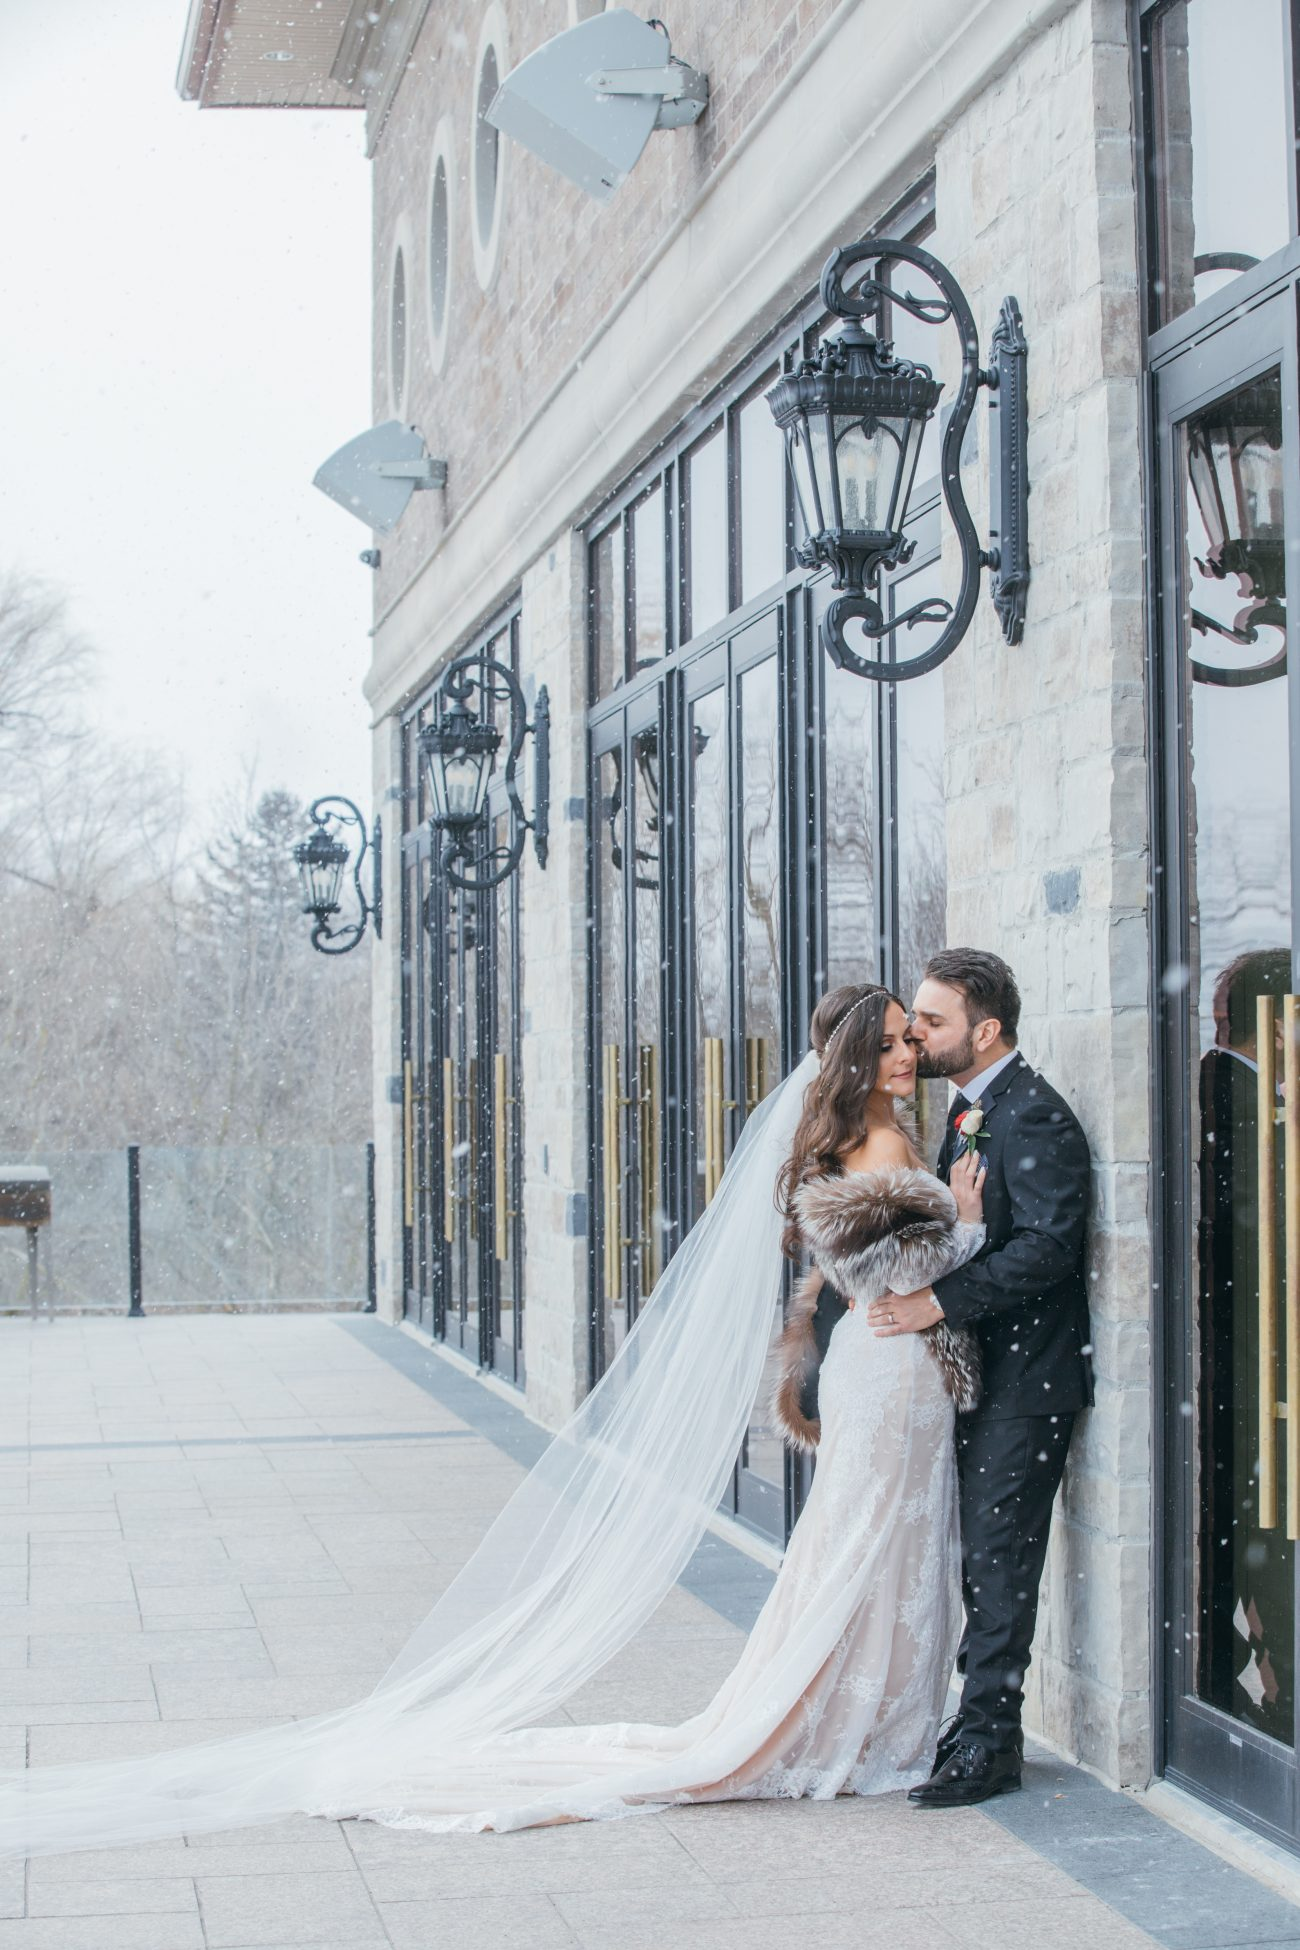 Majestic winter wedding at the Arlington